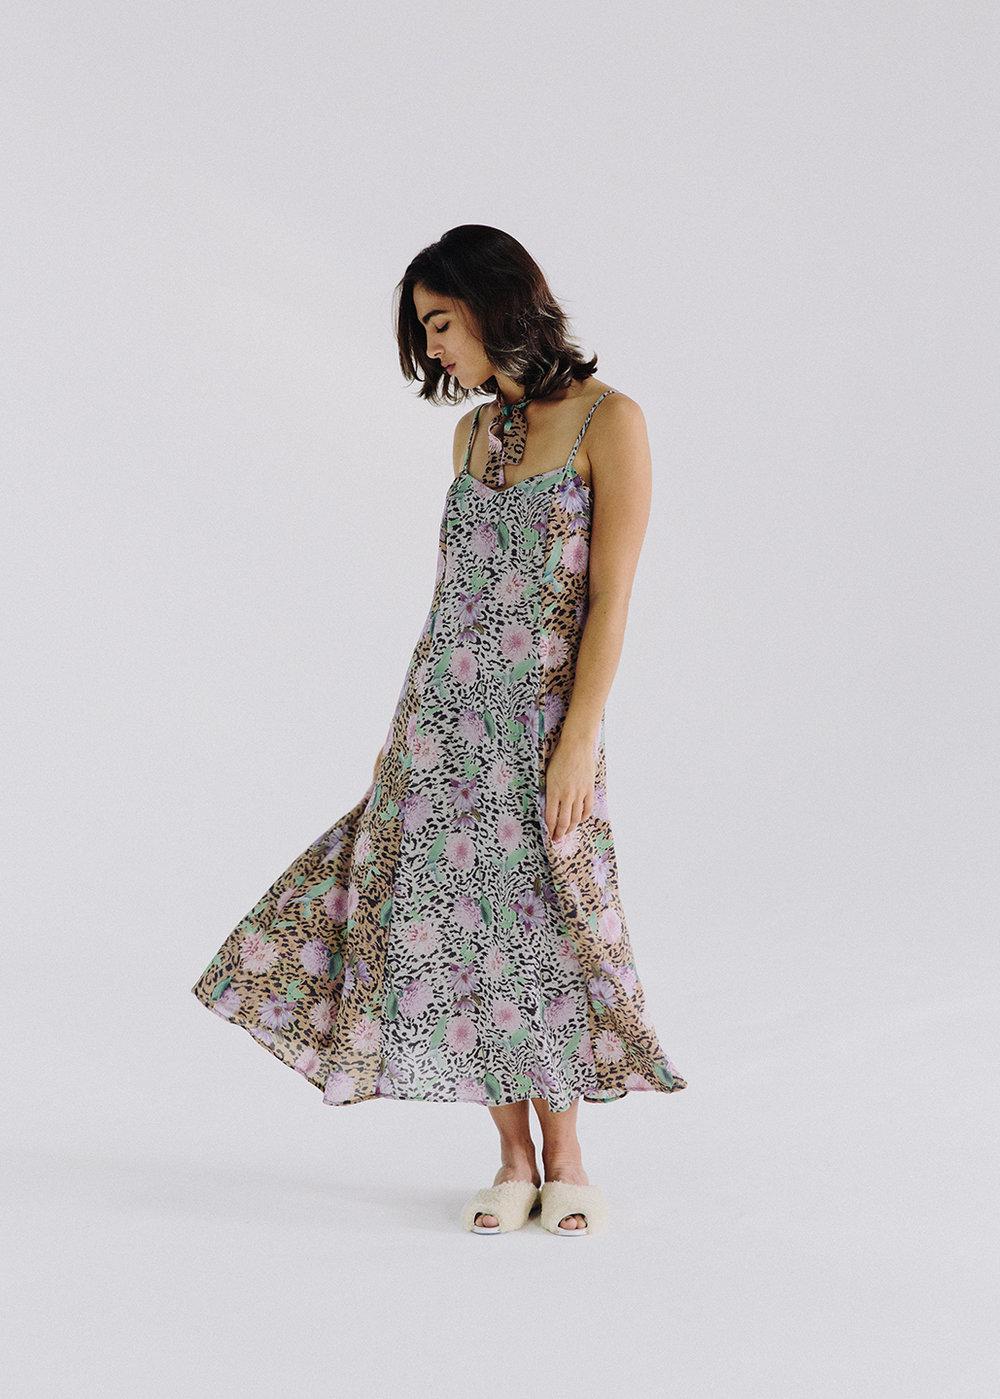 'The Runaway' dress in Wild Dahlia,  $328